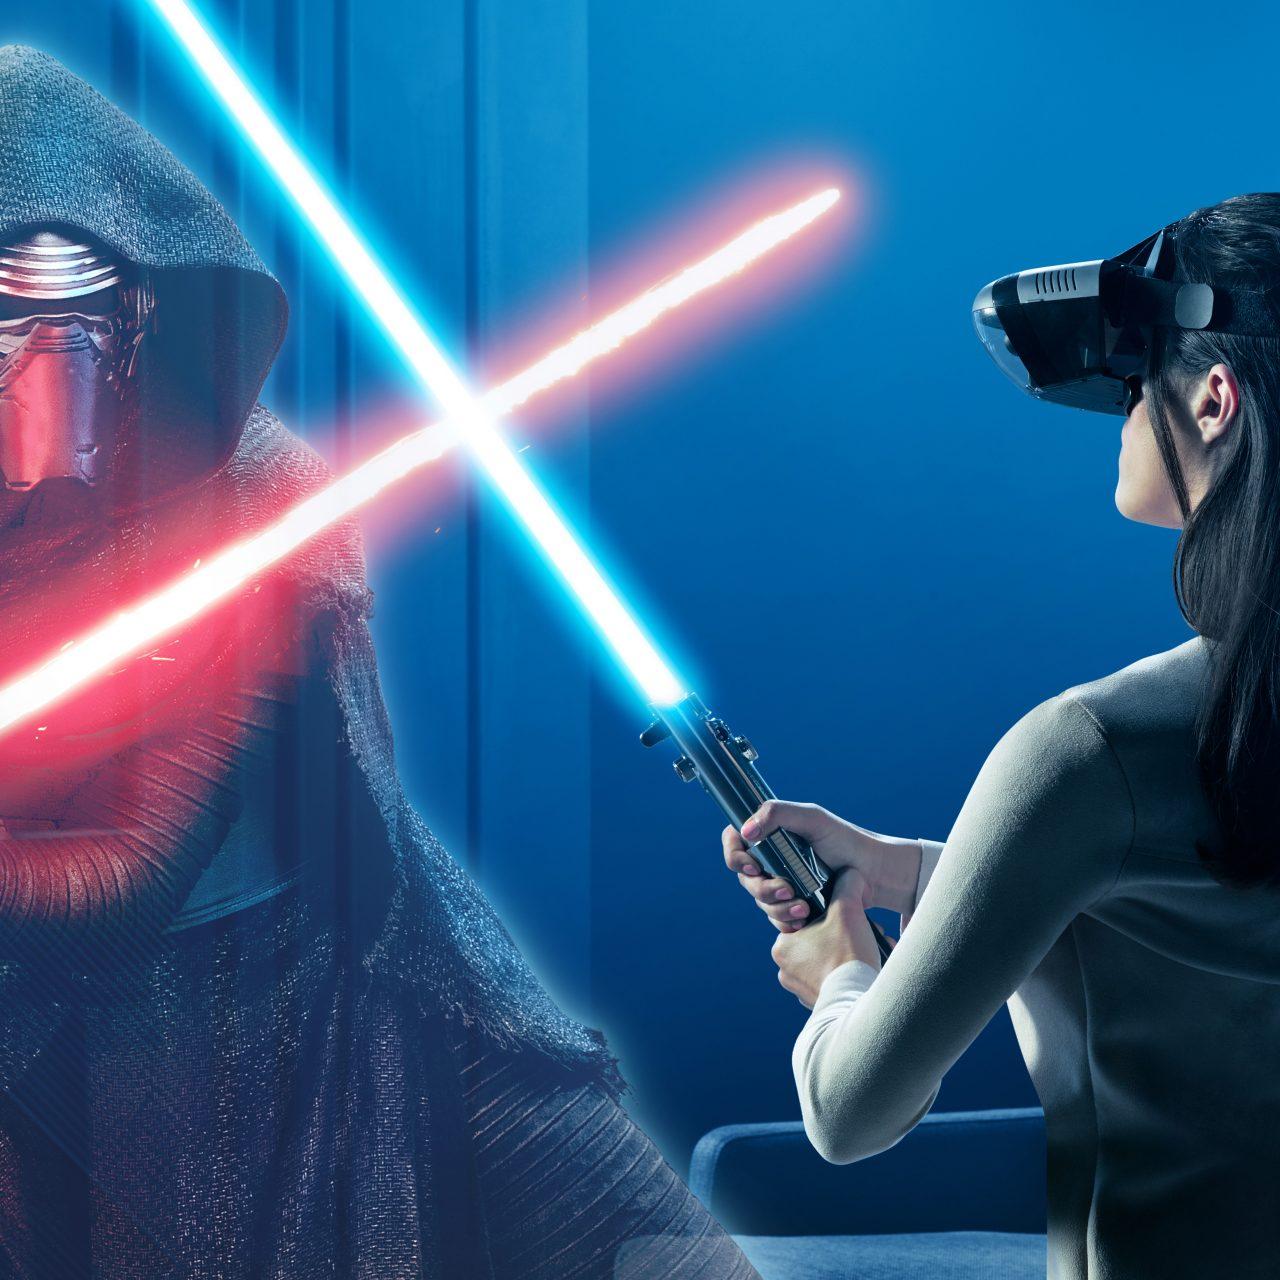 Star Wars Rey Kylo Ren Lightsaber 8k Wallpaper Best Wallpapers